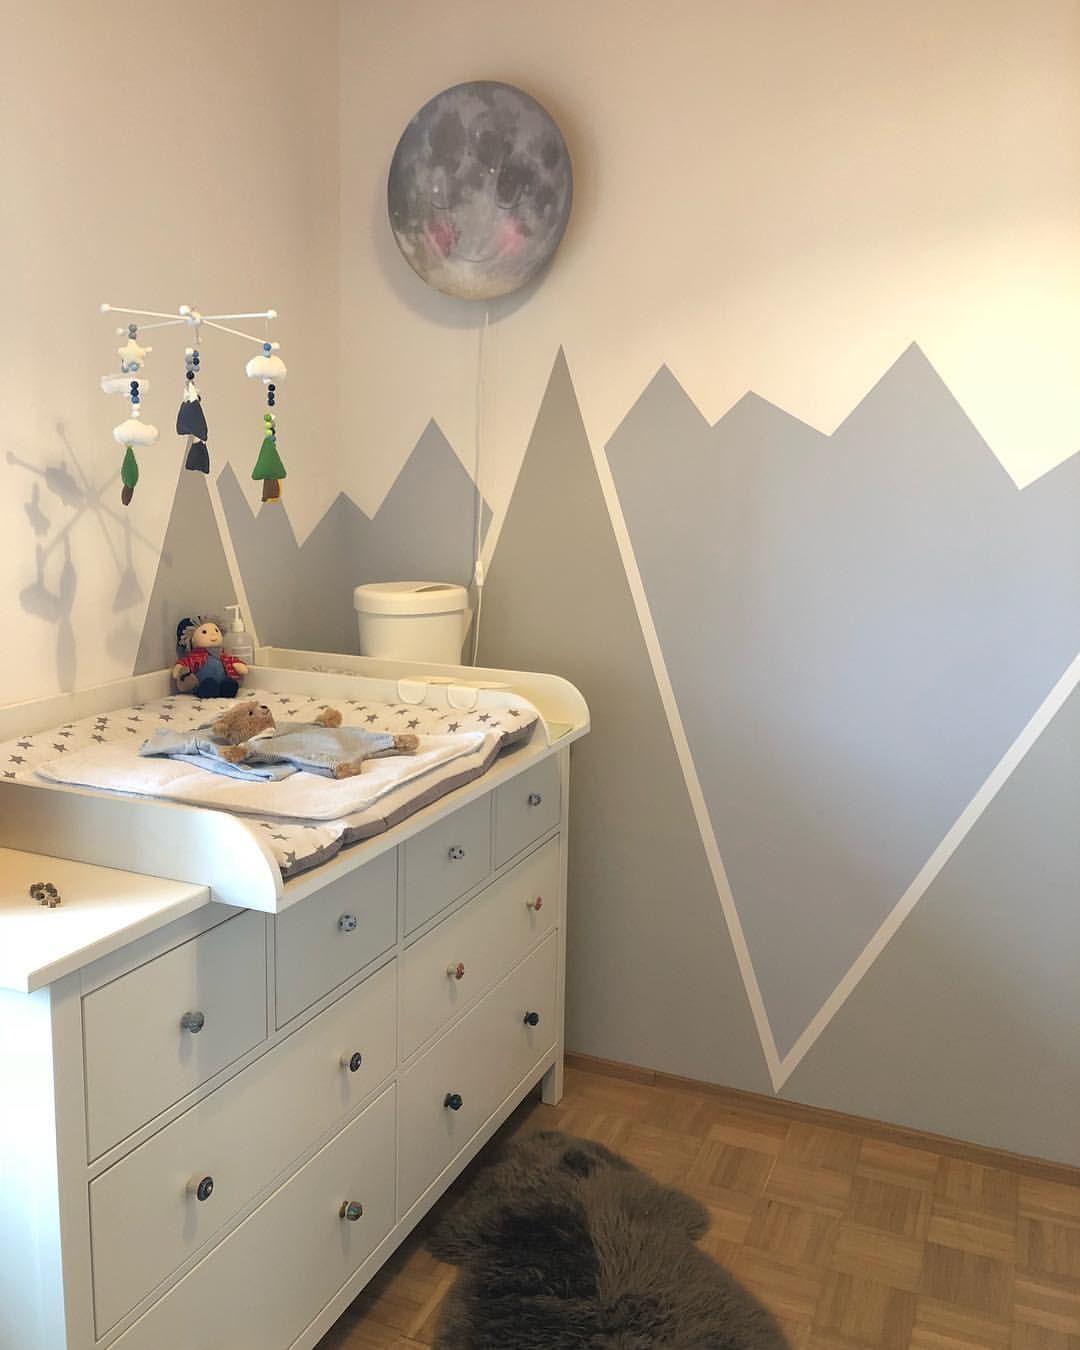 Kinderzimmer Wickeltisch Mobile Berge Wandgestaltung Loveit Babyboy Moon Ikea Hartendief Baby Room Furniture Nursery Room Boy Girl Nursery Diy